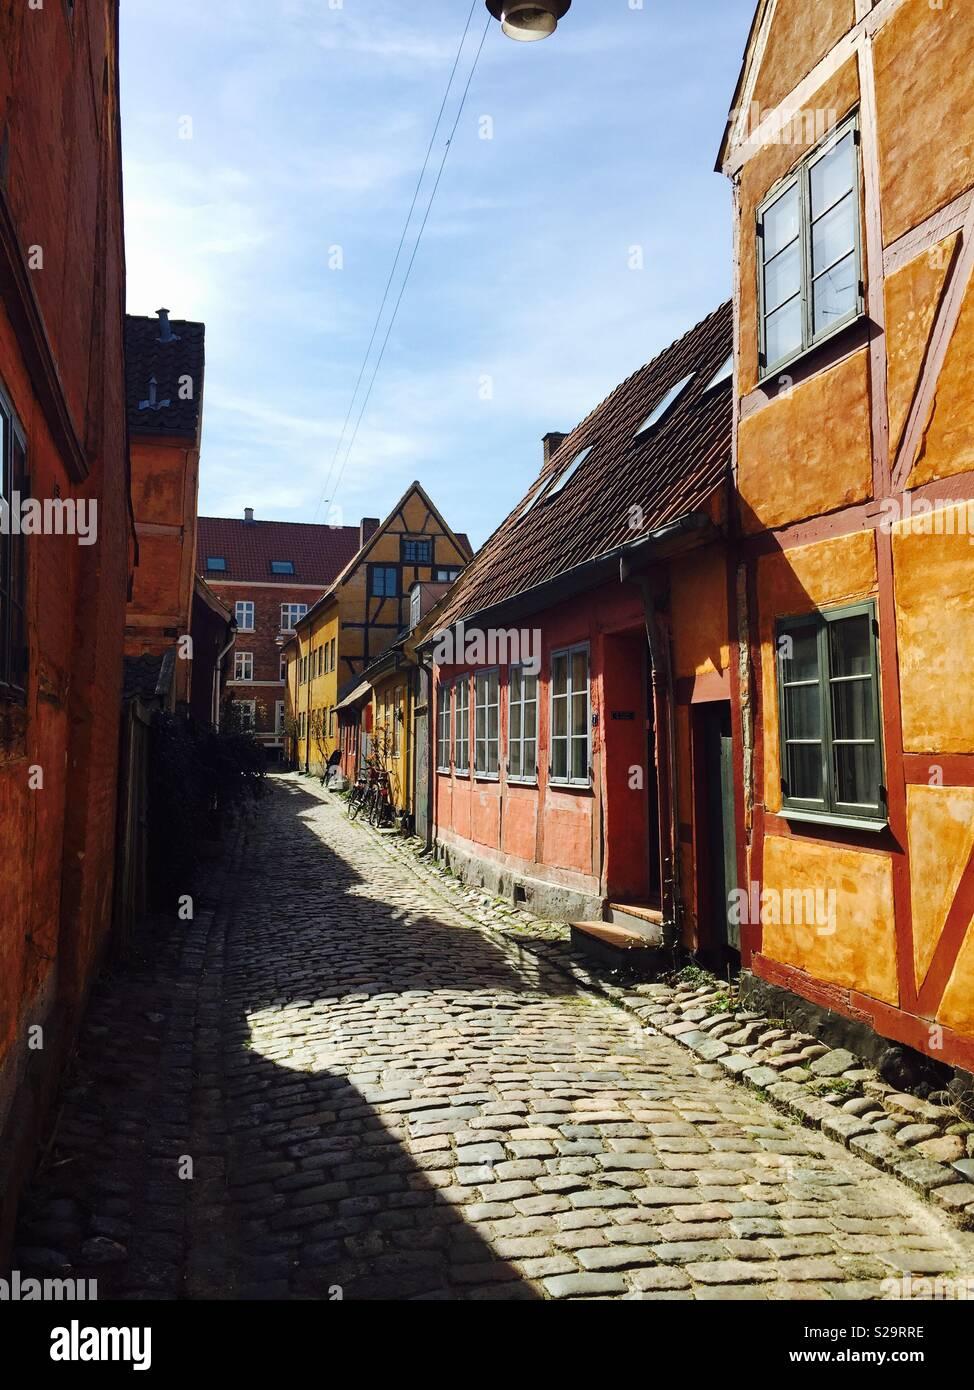 An old colorful street in Helsingoer, Denmark - Stock Image